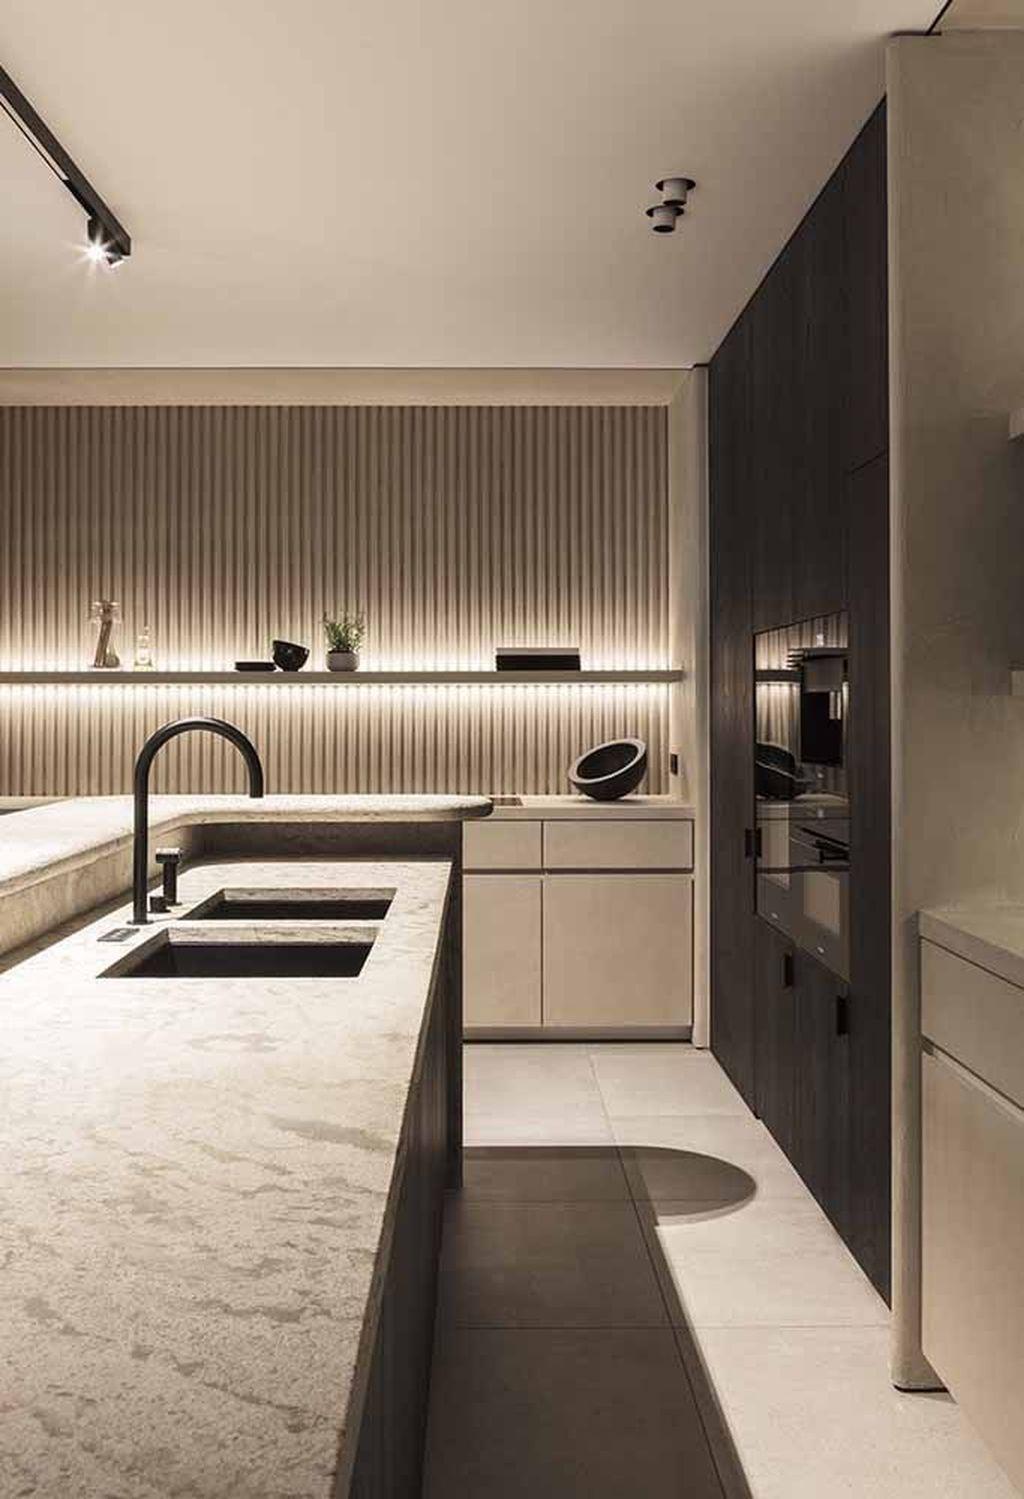 31 Beautiful Modern Condo Kitchen Design And Decor Ideas Contemporary Kitchen Design Luxury Kitchen Design Modern Kitchen Design